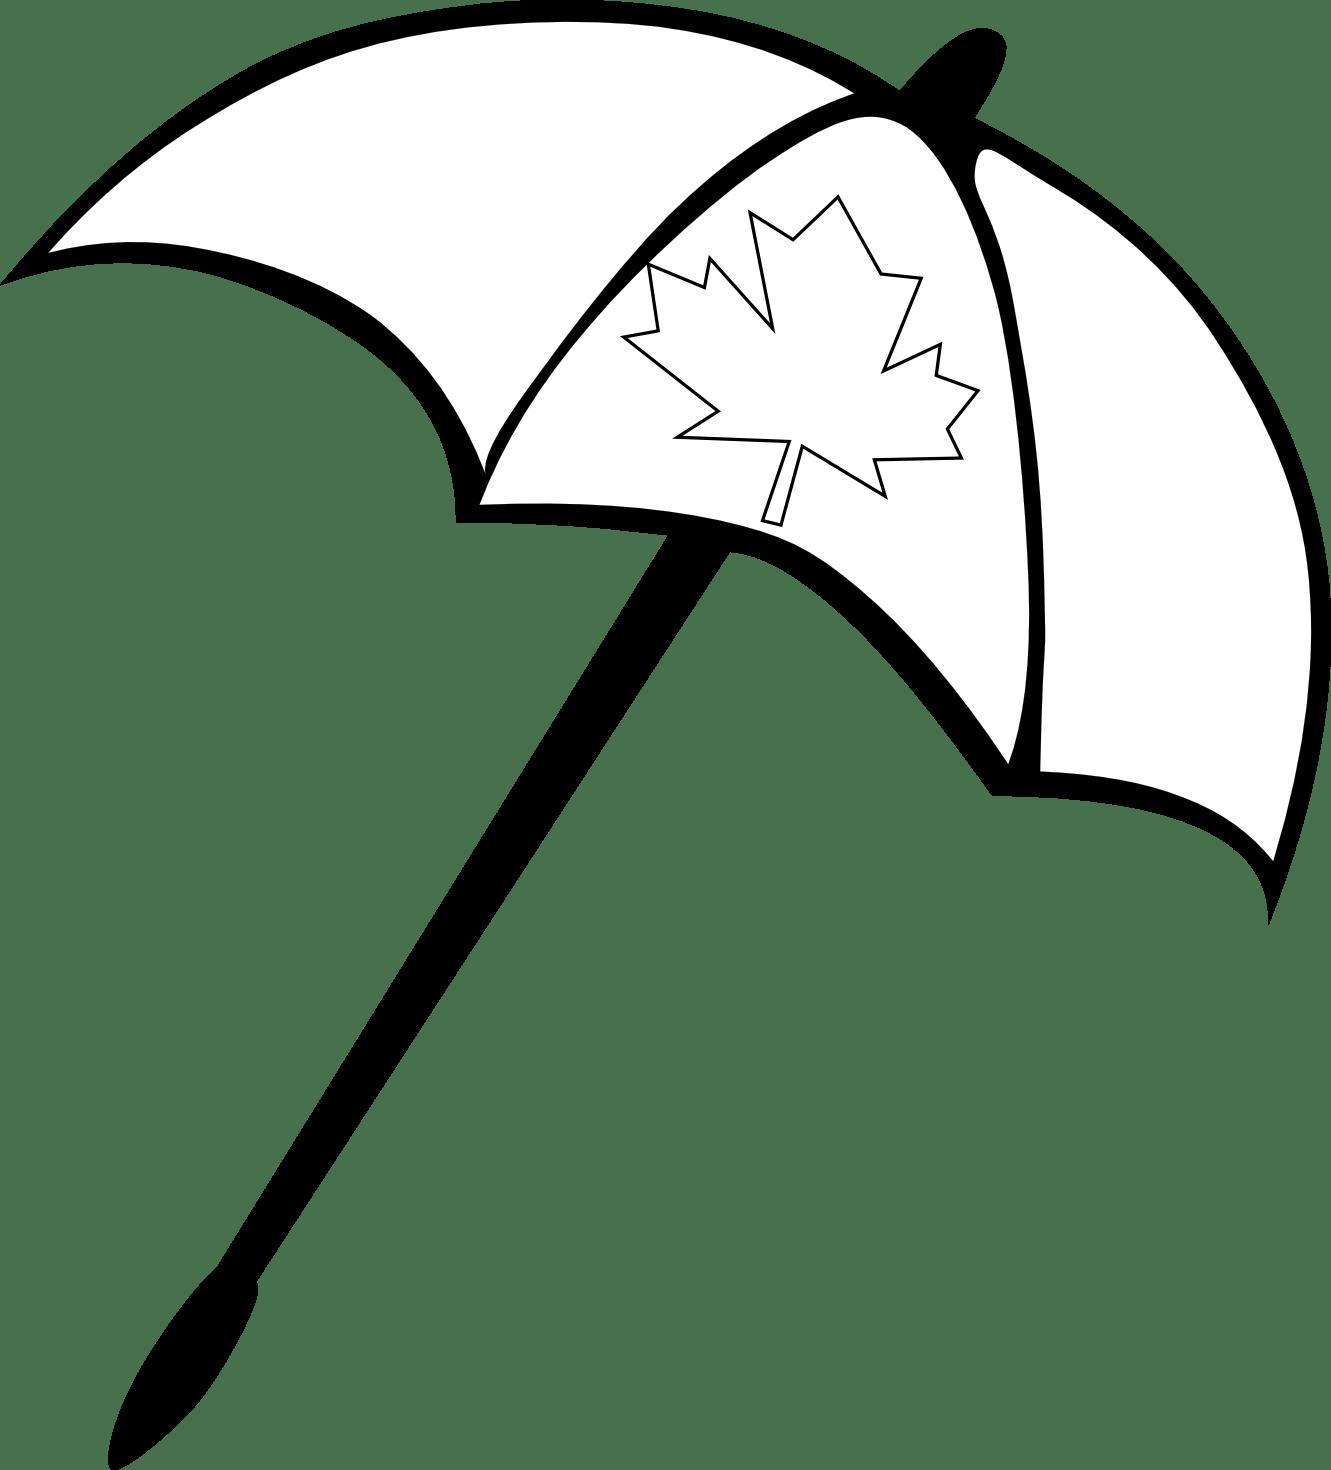 Clipart Umbrella Sketch Clipart Umbrella Sketch Transparent Free For Download On Webstockreview 2020